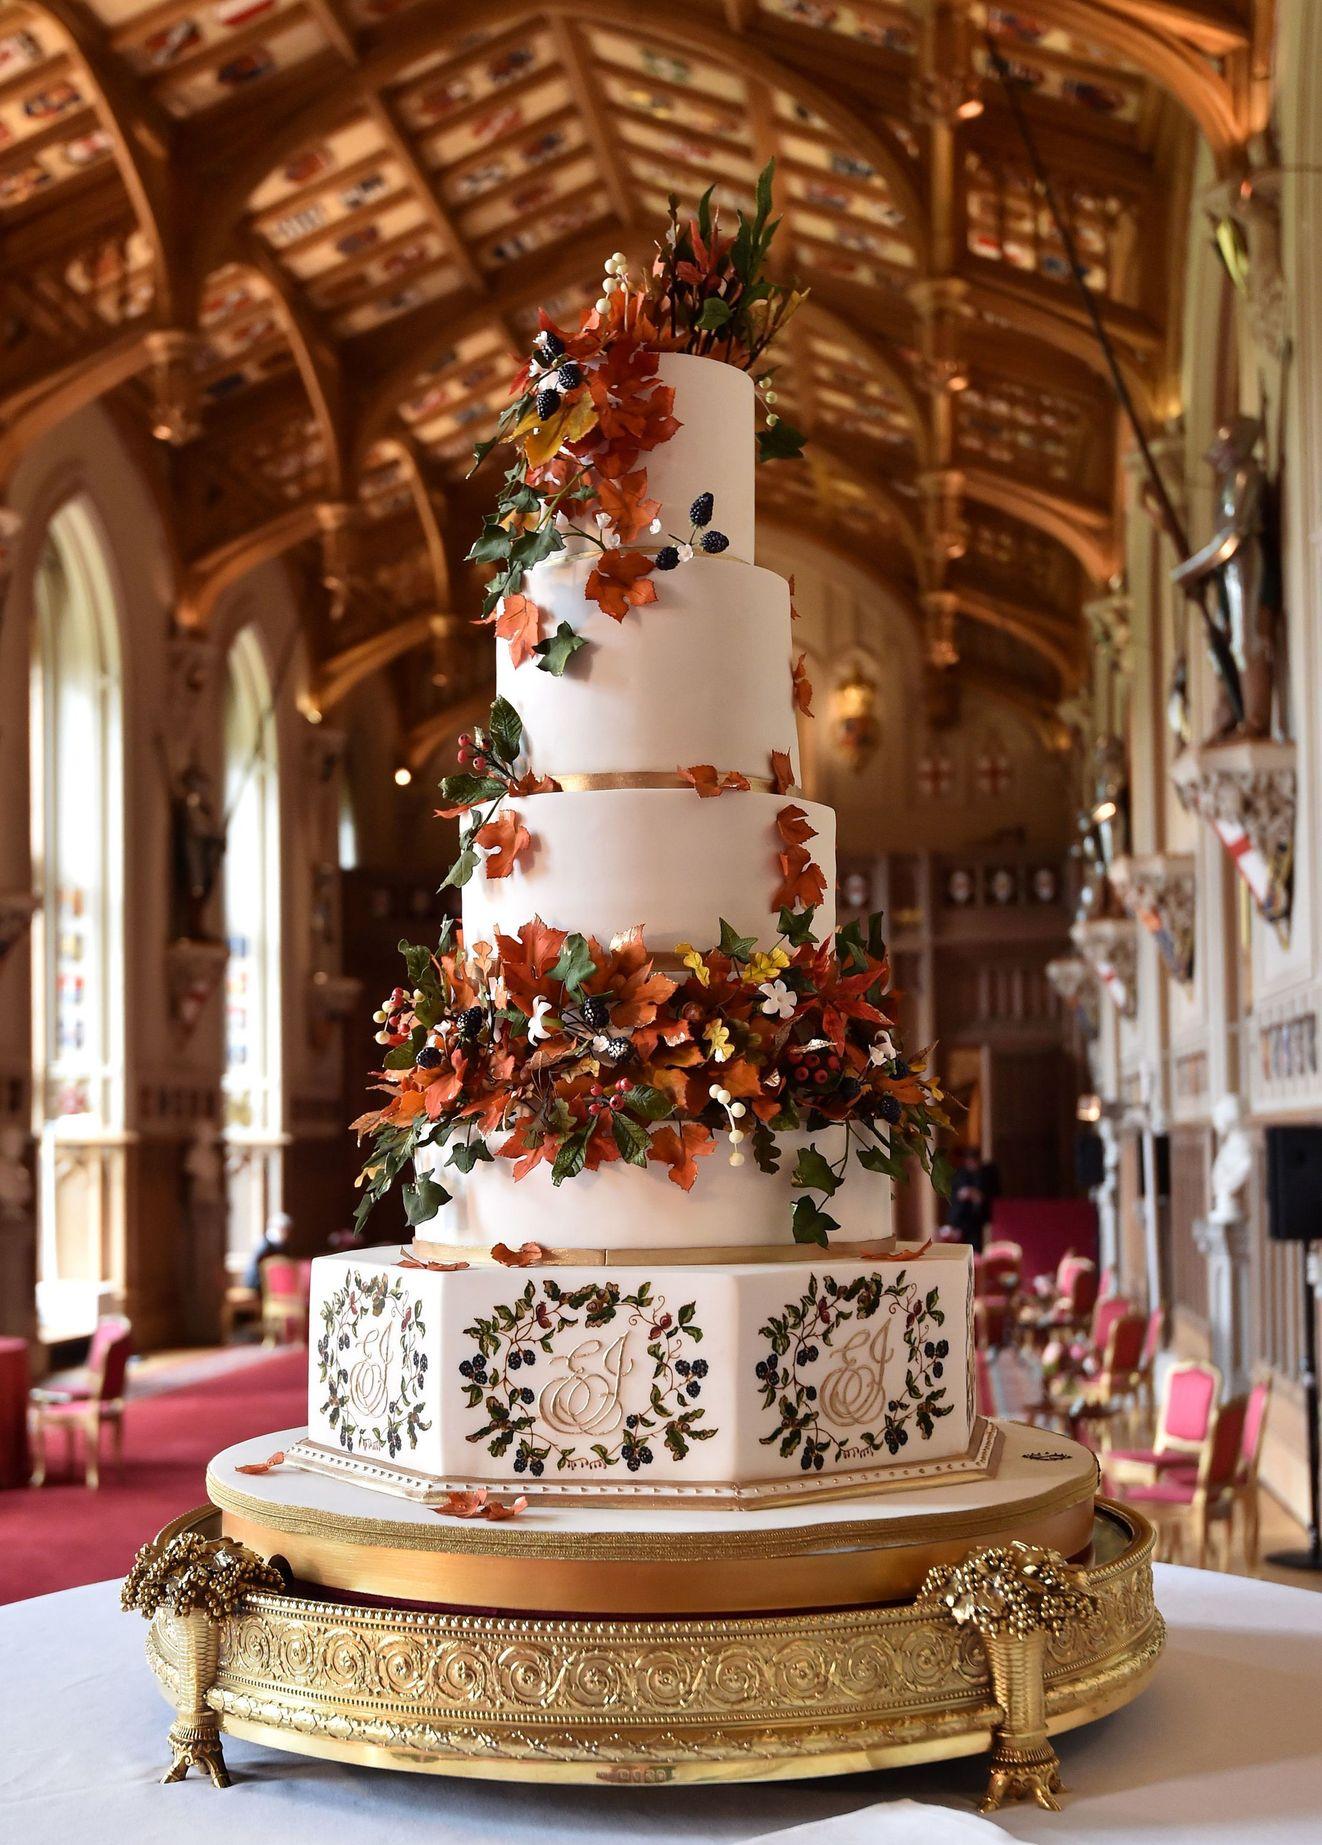 Eugenies wedding cake